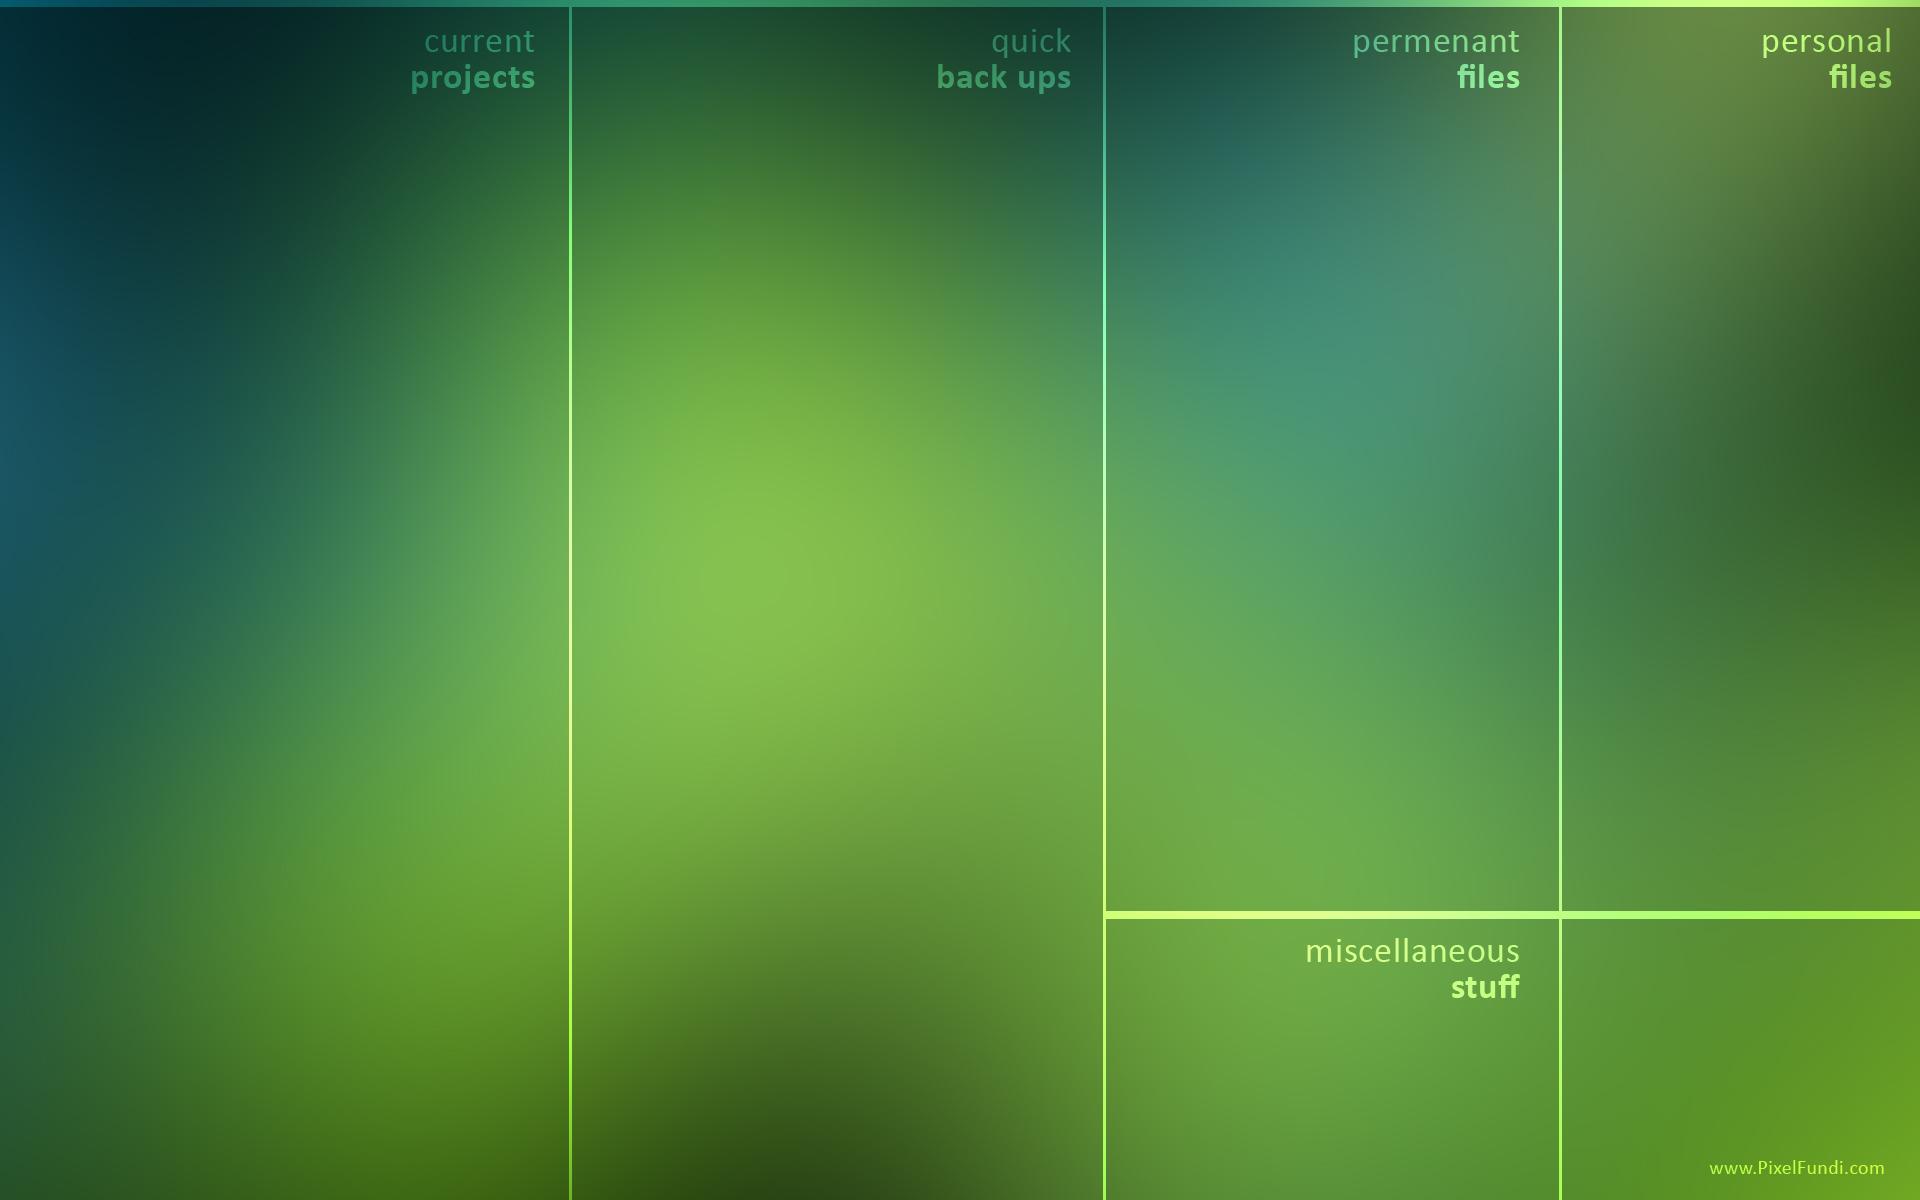 Desktop Organizer Wallpaper Lifehacker 102 images in Collection 1920x1200